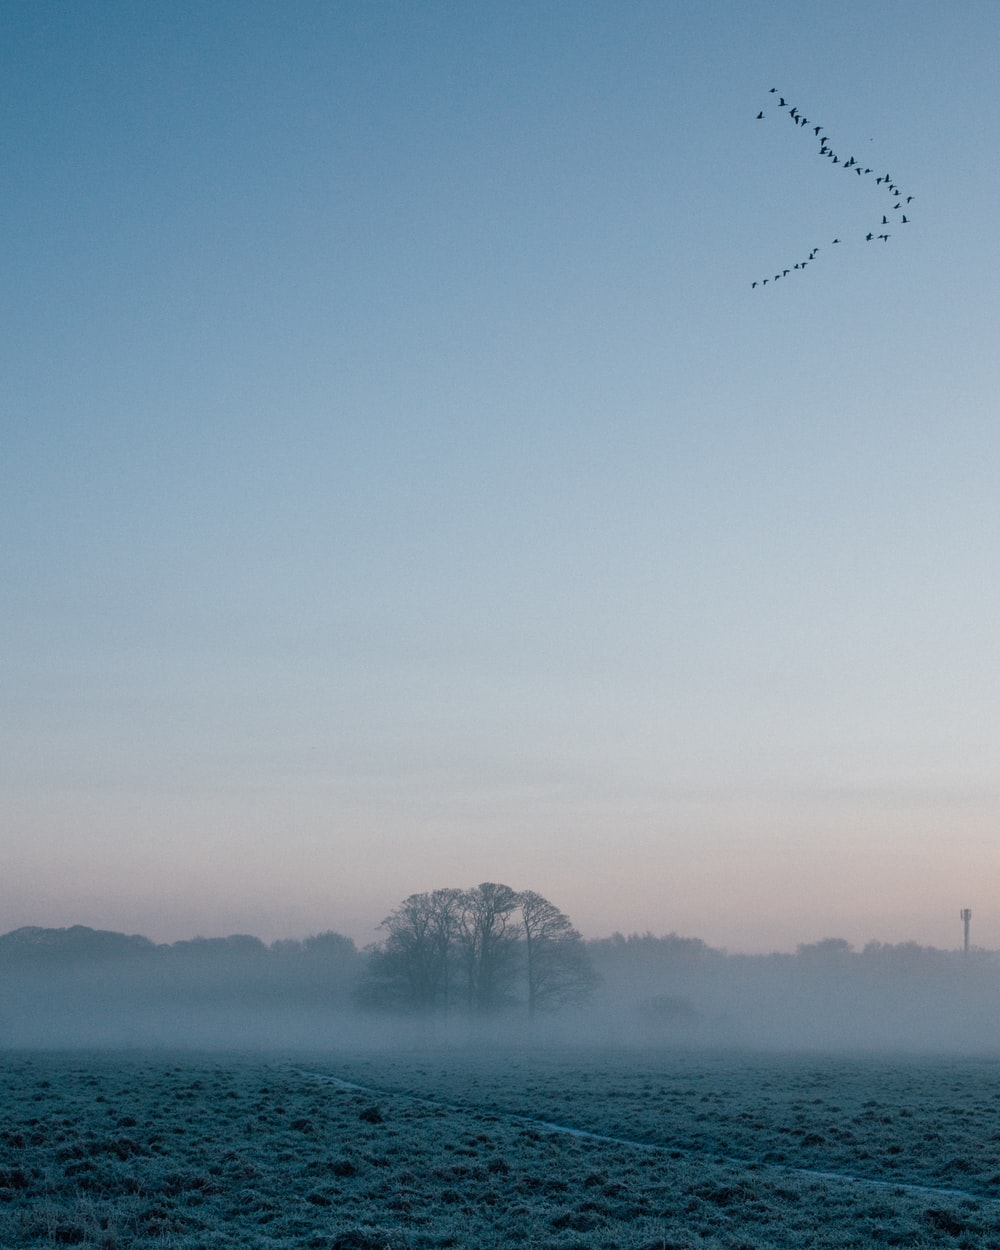 trees under white fogs